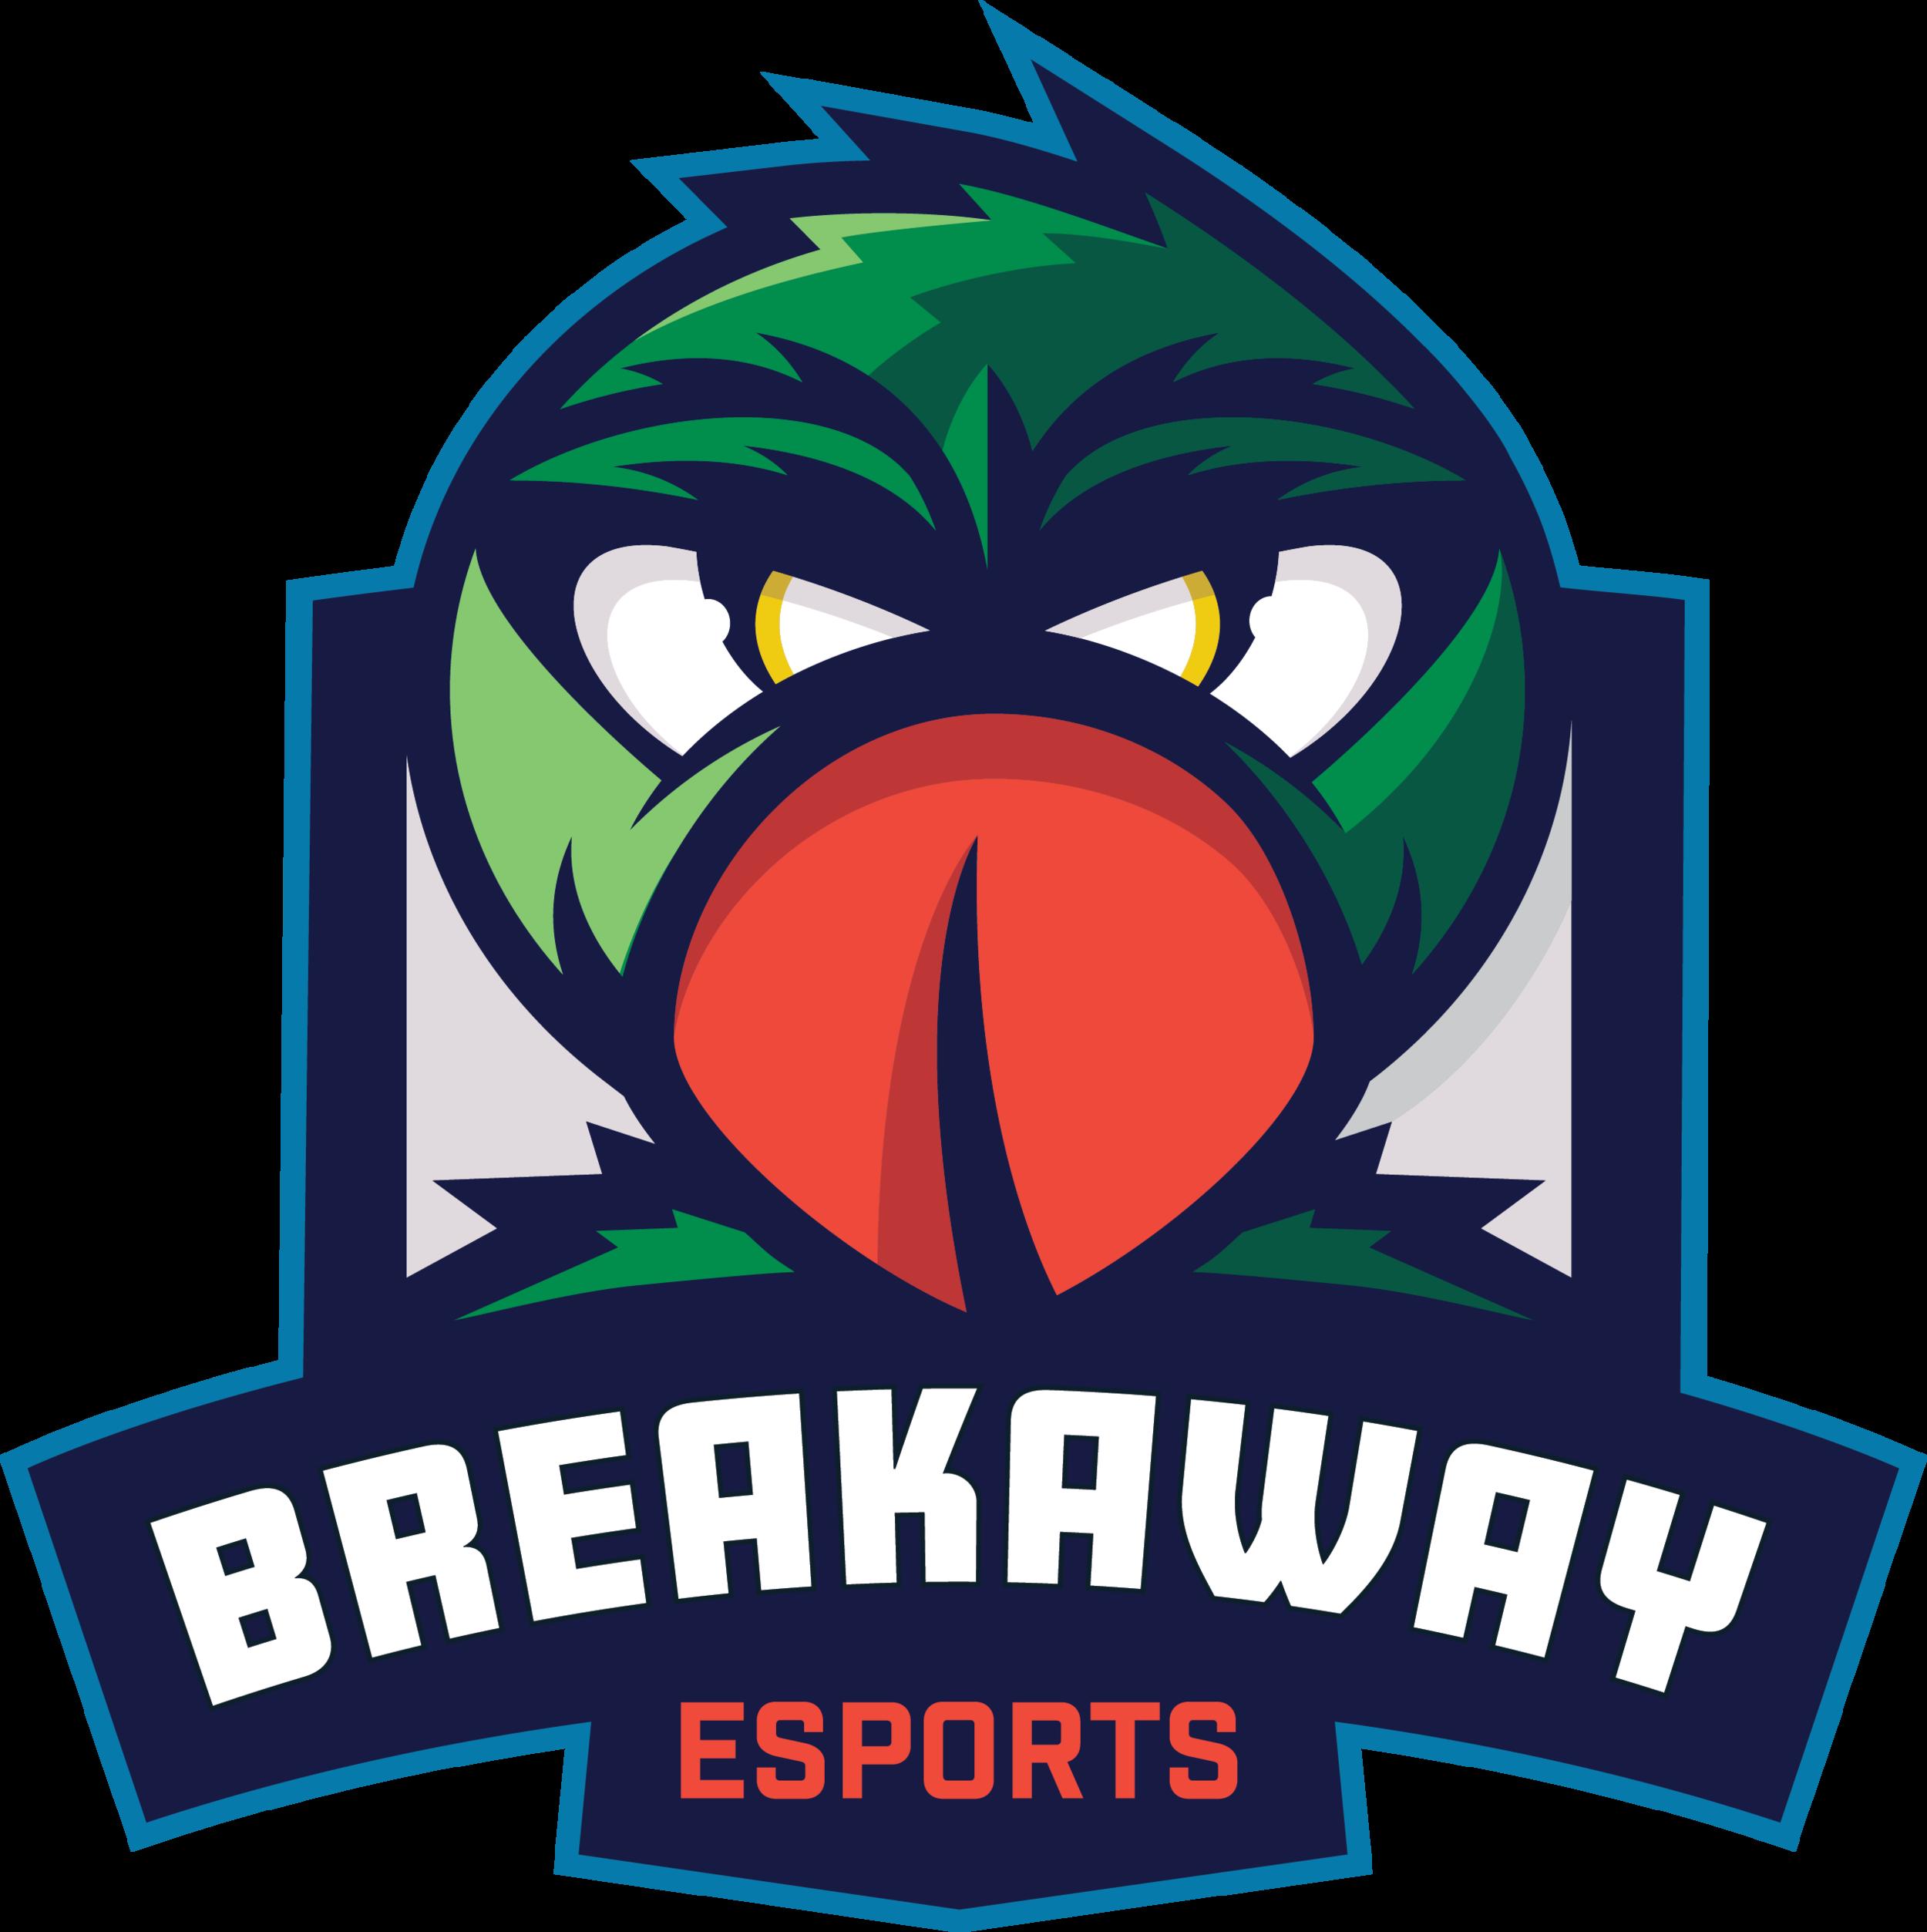 Breakaway_Esports_Logo-light.png